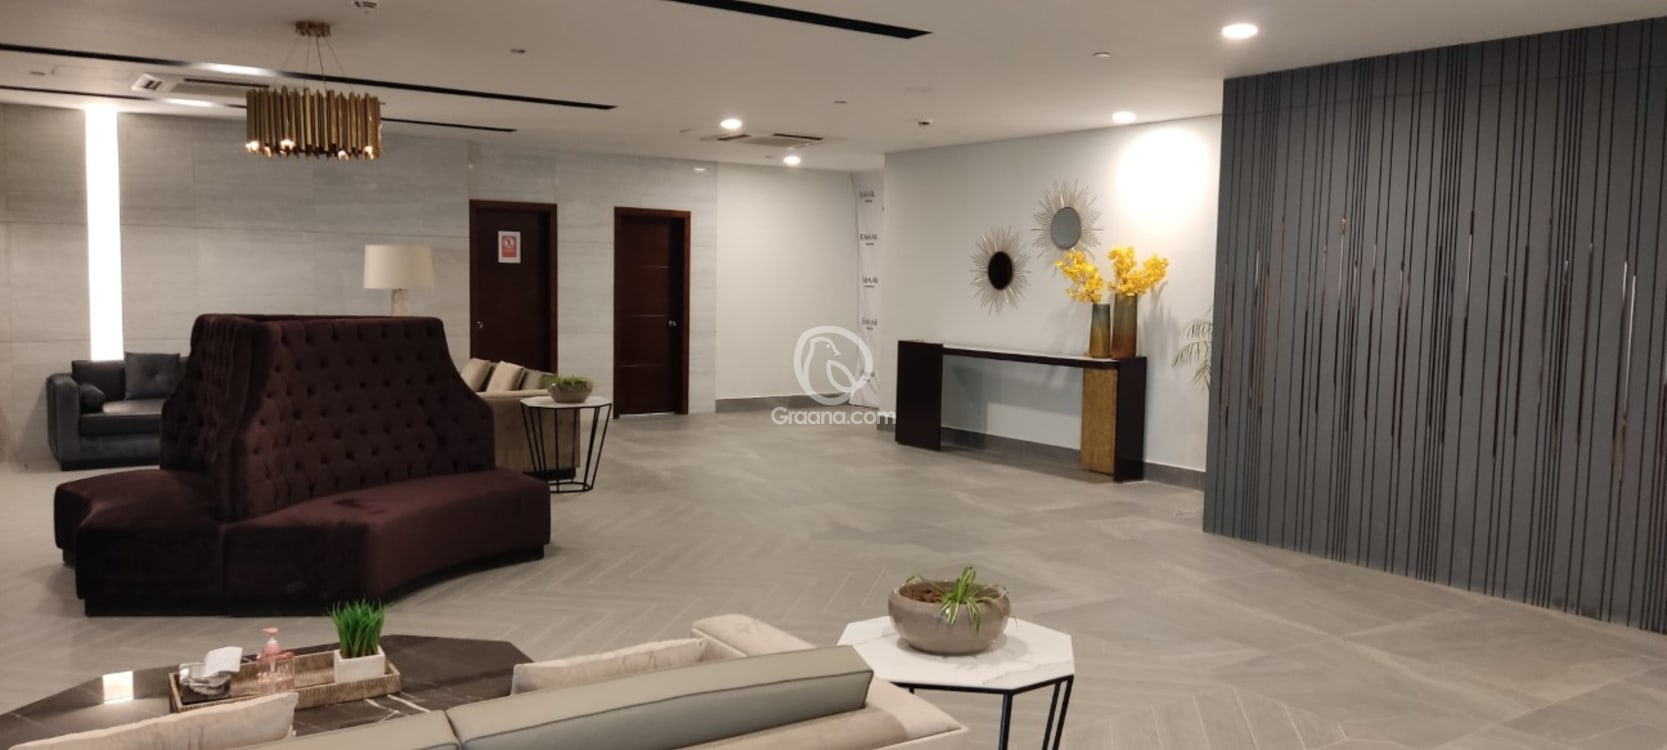 2190 Sqft Apartment for Sale    Graana.com